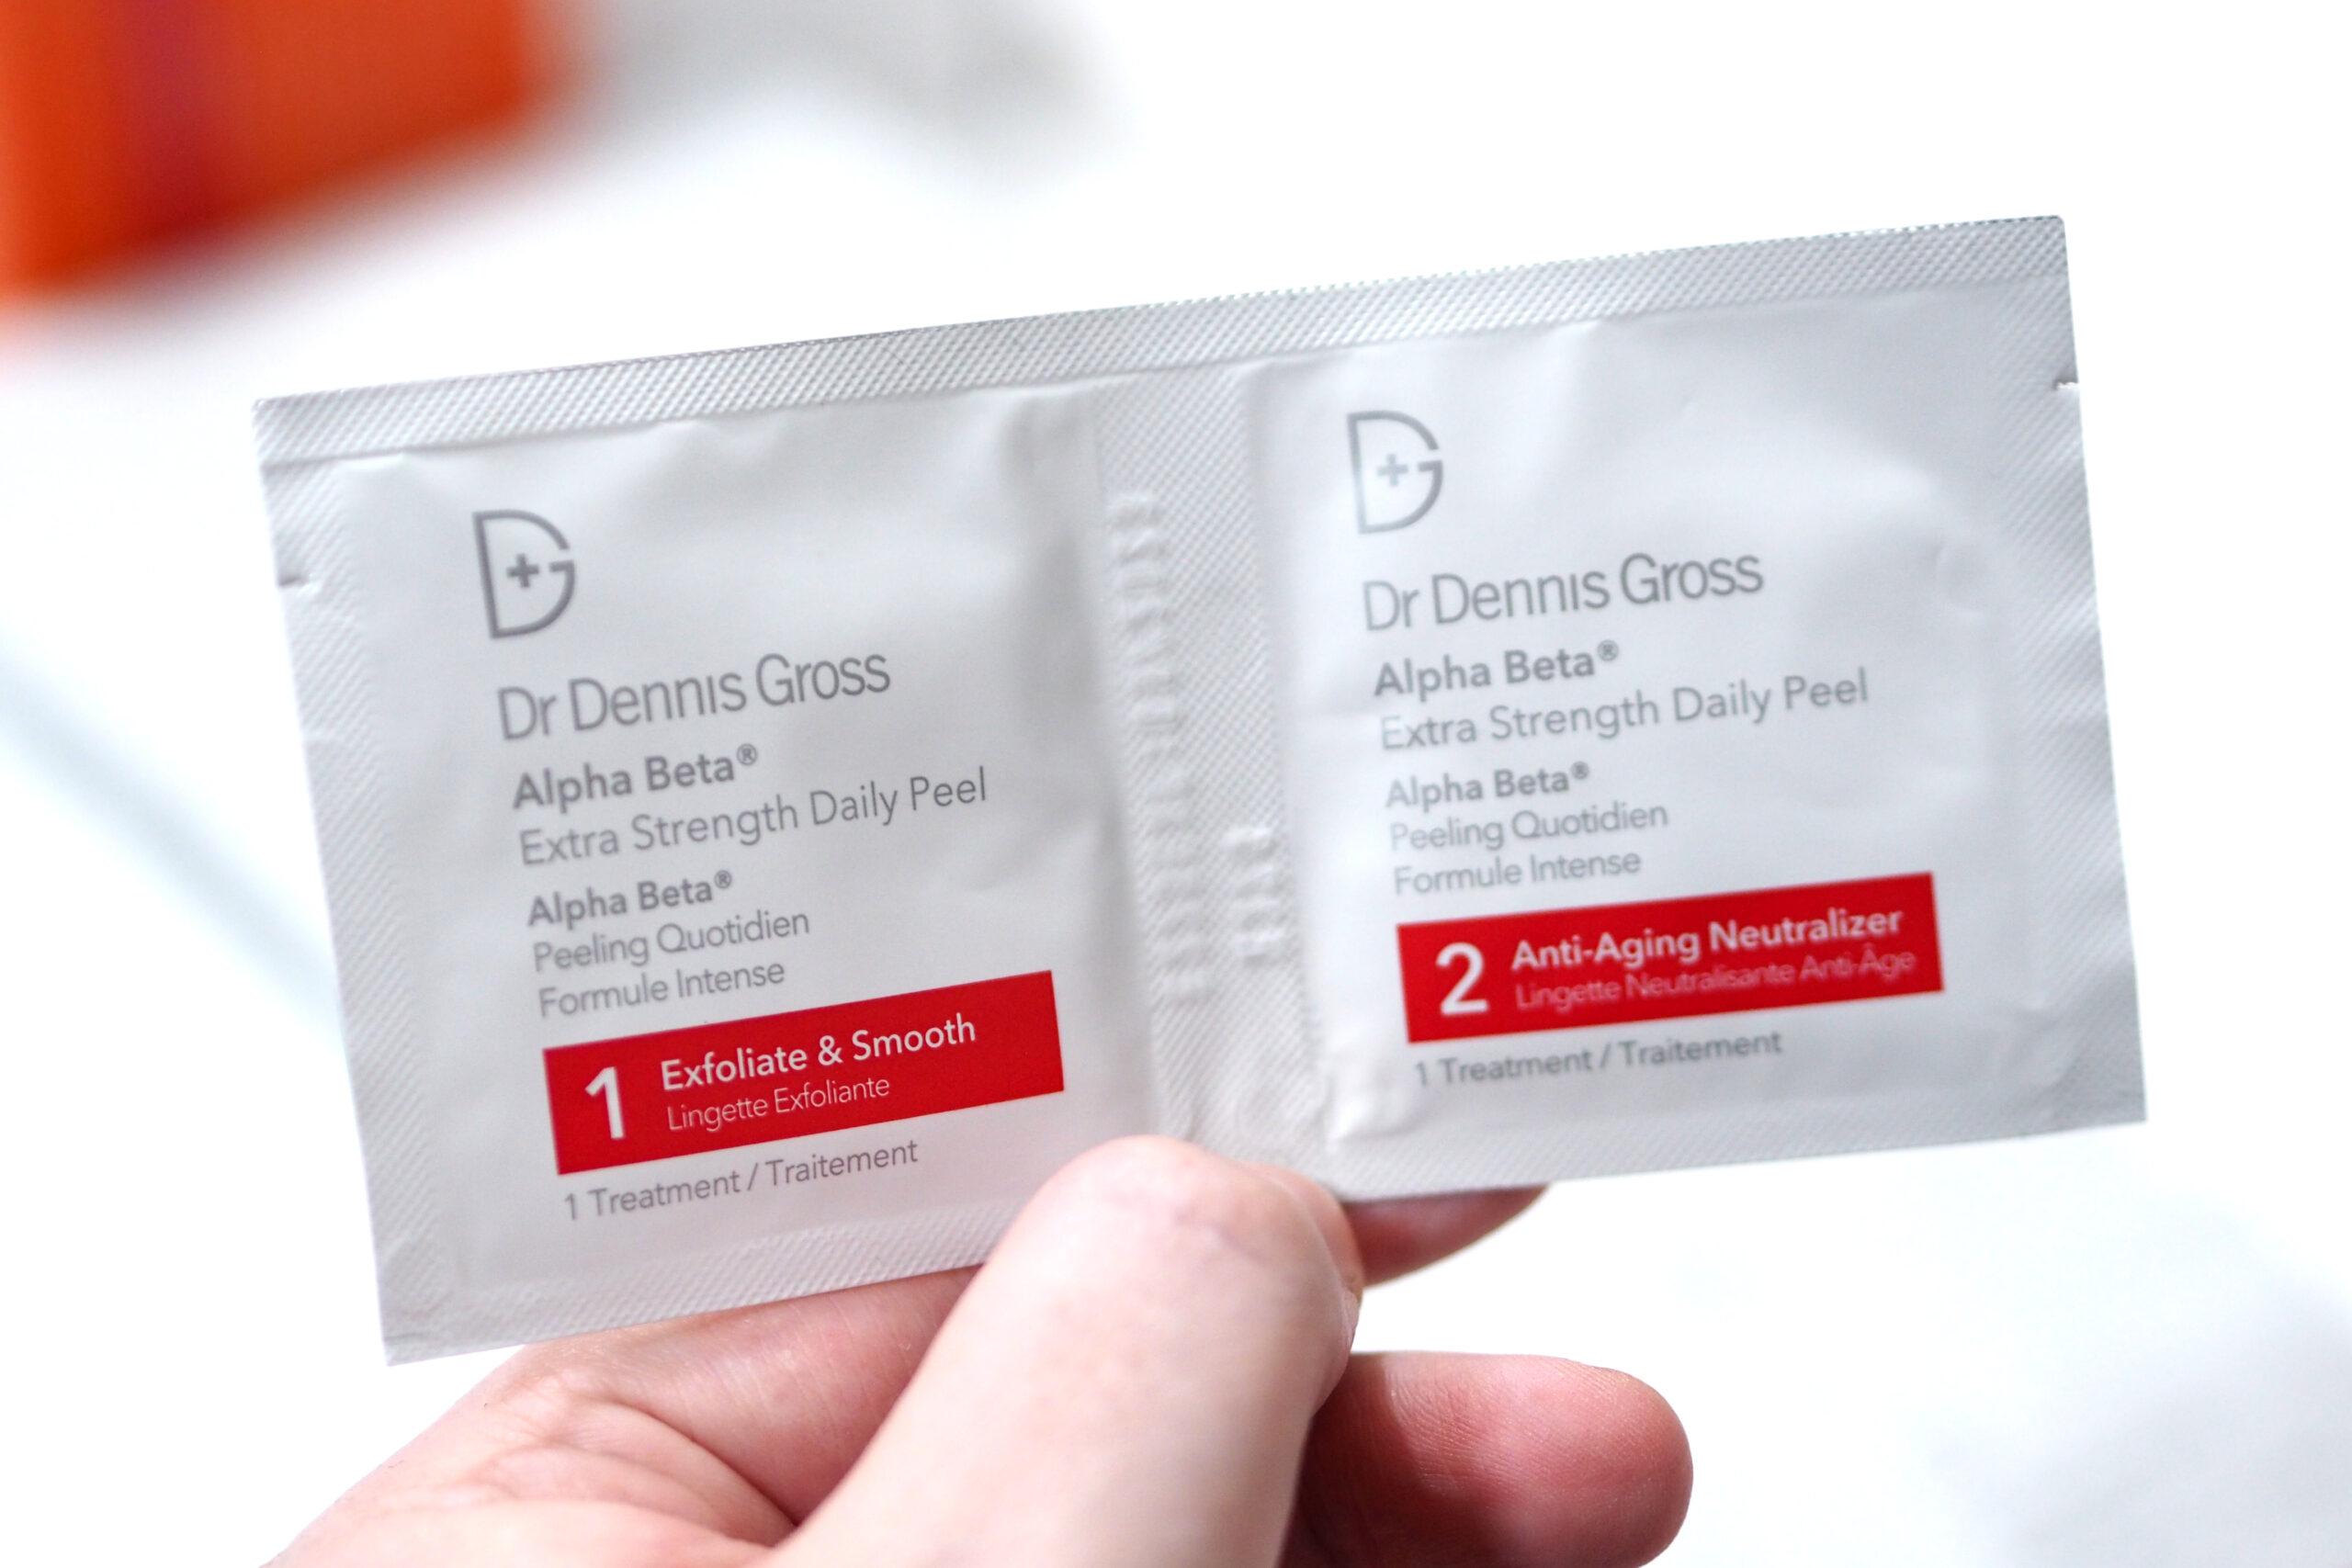 Dr Dennis Gross Alpha Beta Head to Toe Glow Set